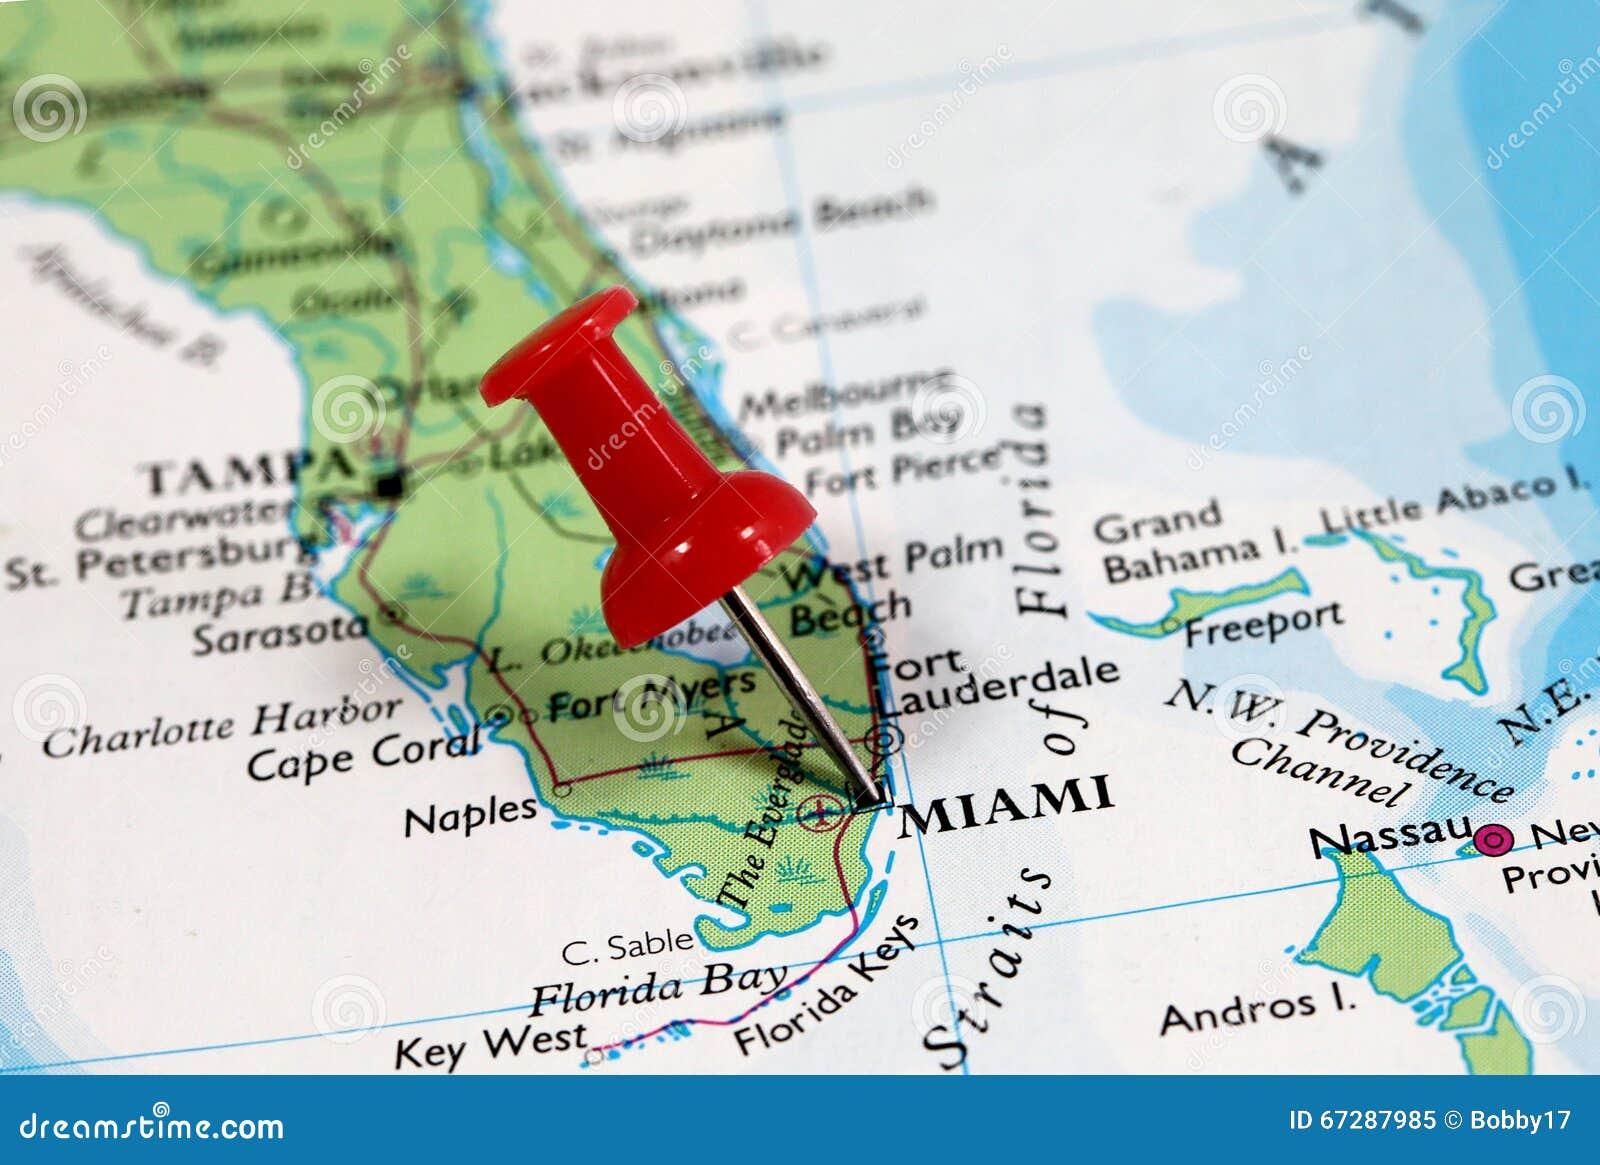 miami in florida, usa stockbild. bild von druckbolzen - 67287985